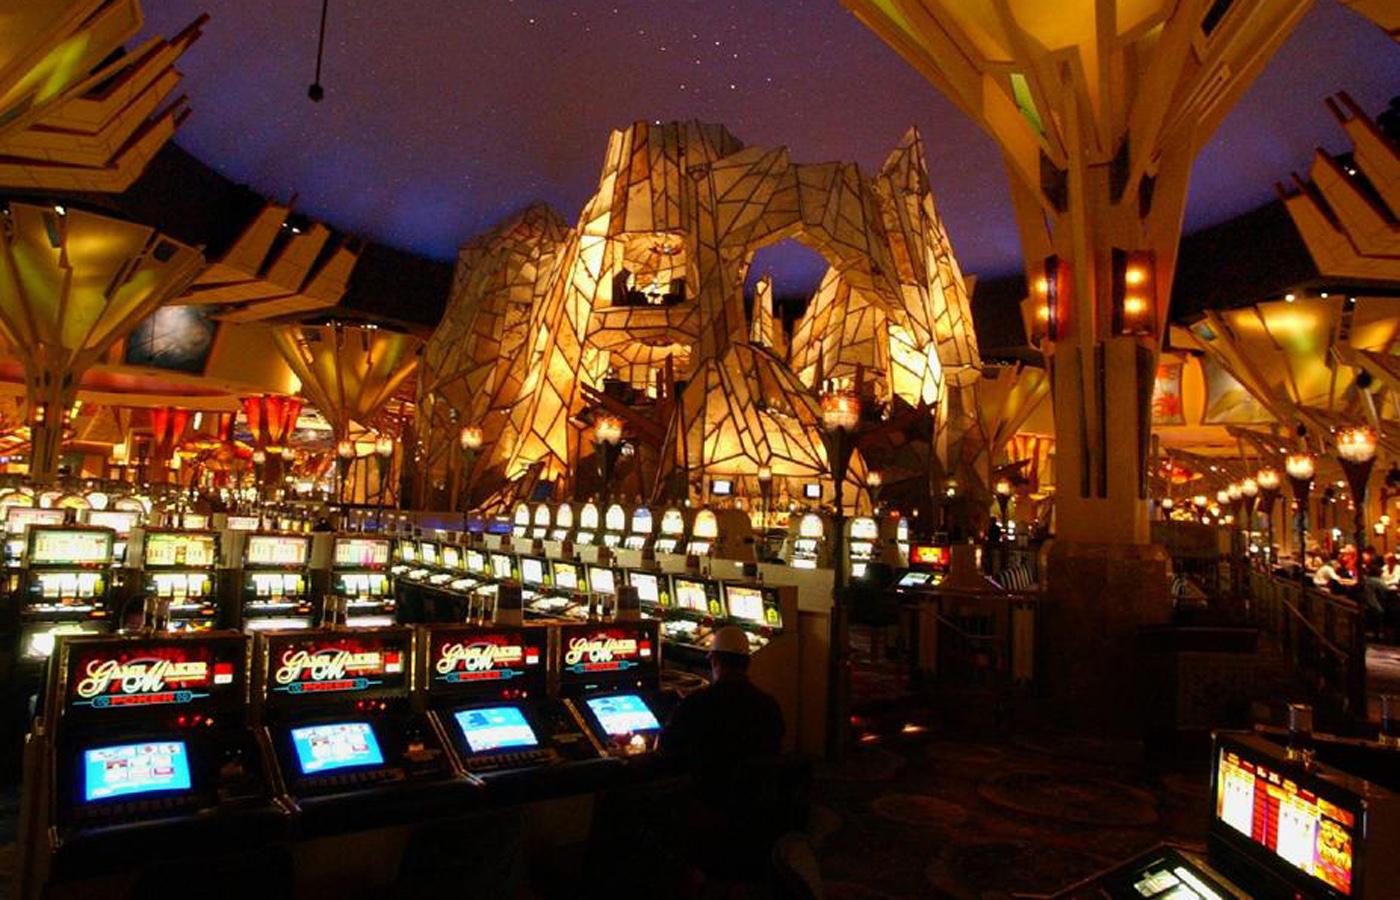 Foxwood casino big bucks day modern warfare 2 short game